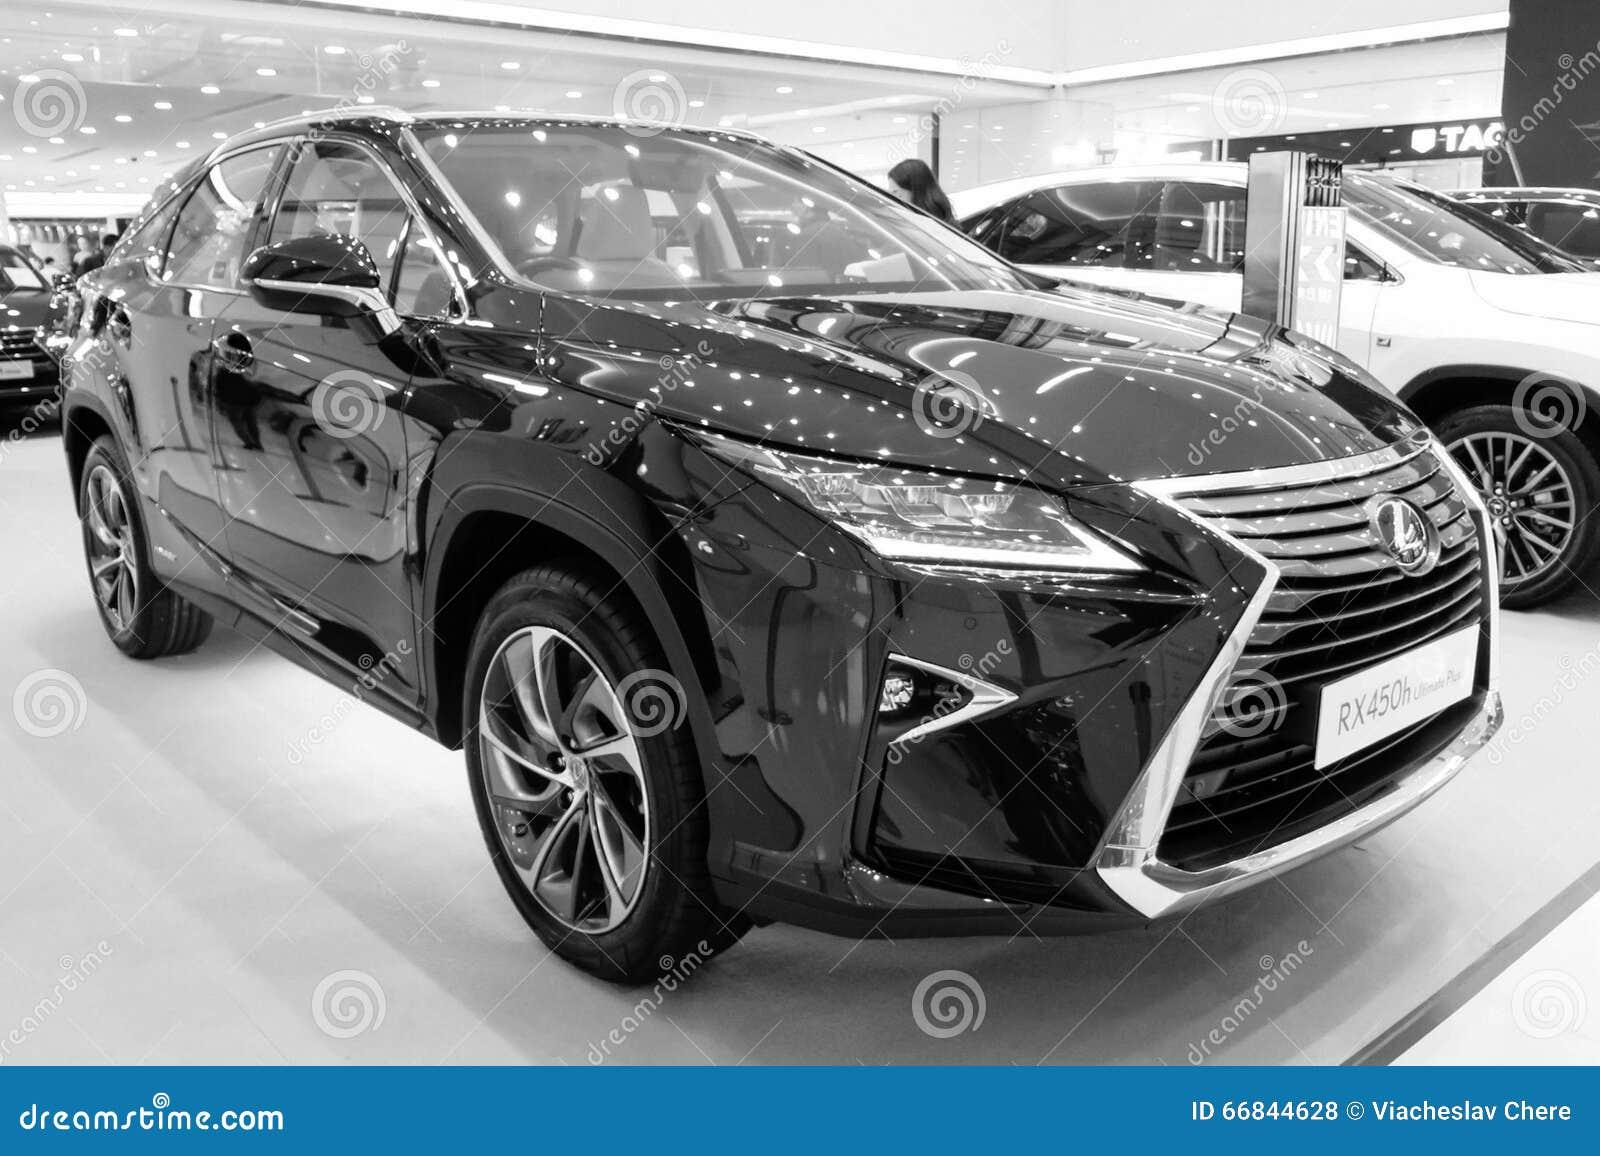 Exhibition Presentation Of A New Car Model Lexus Editorial Stock